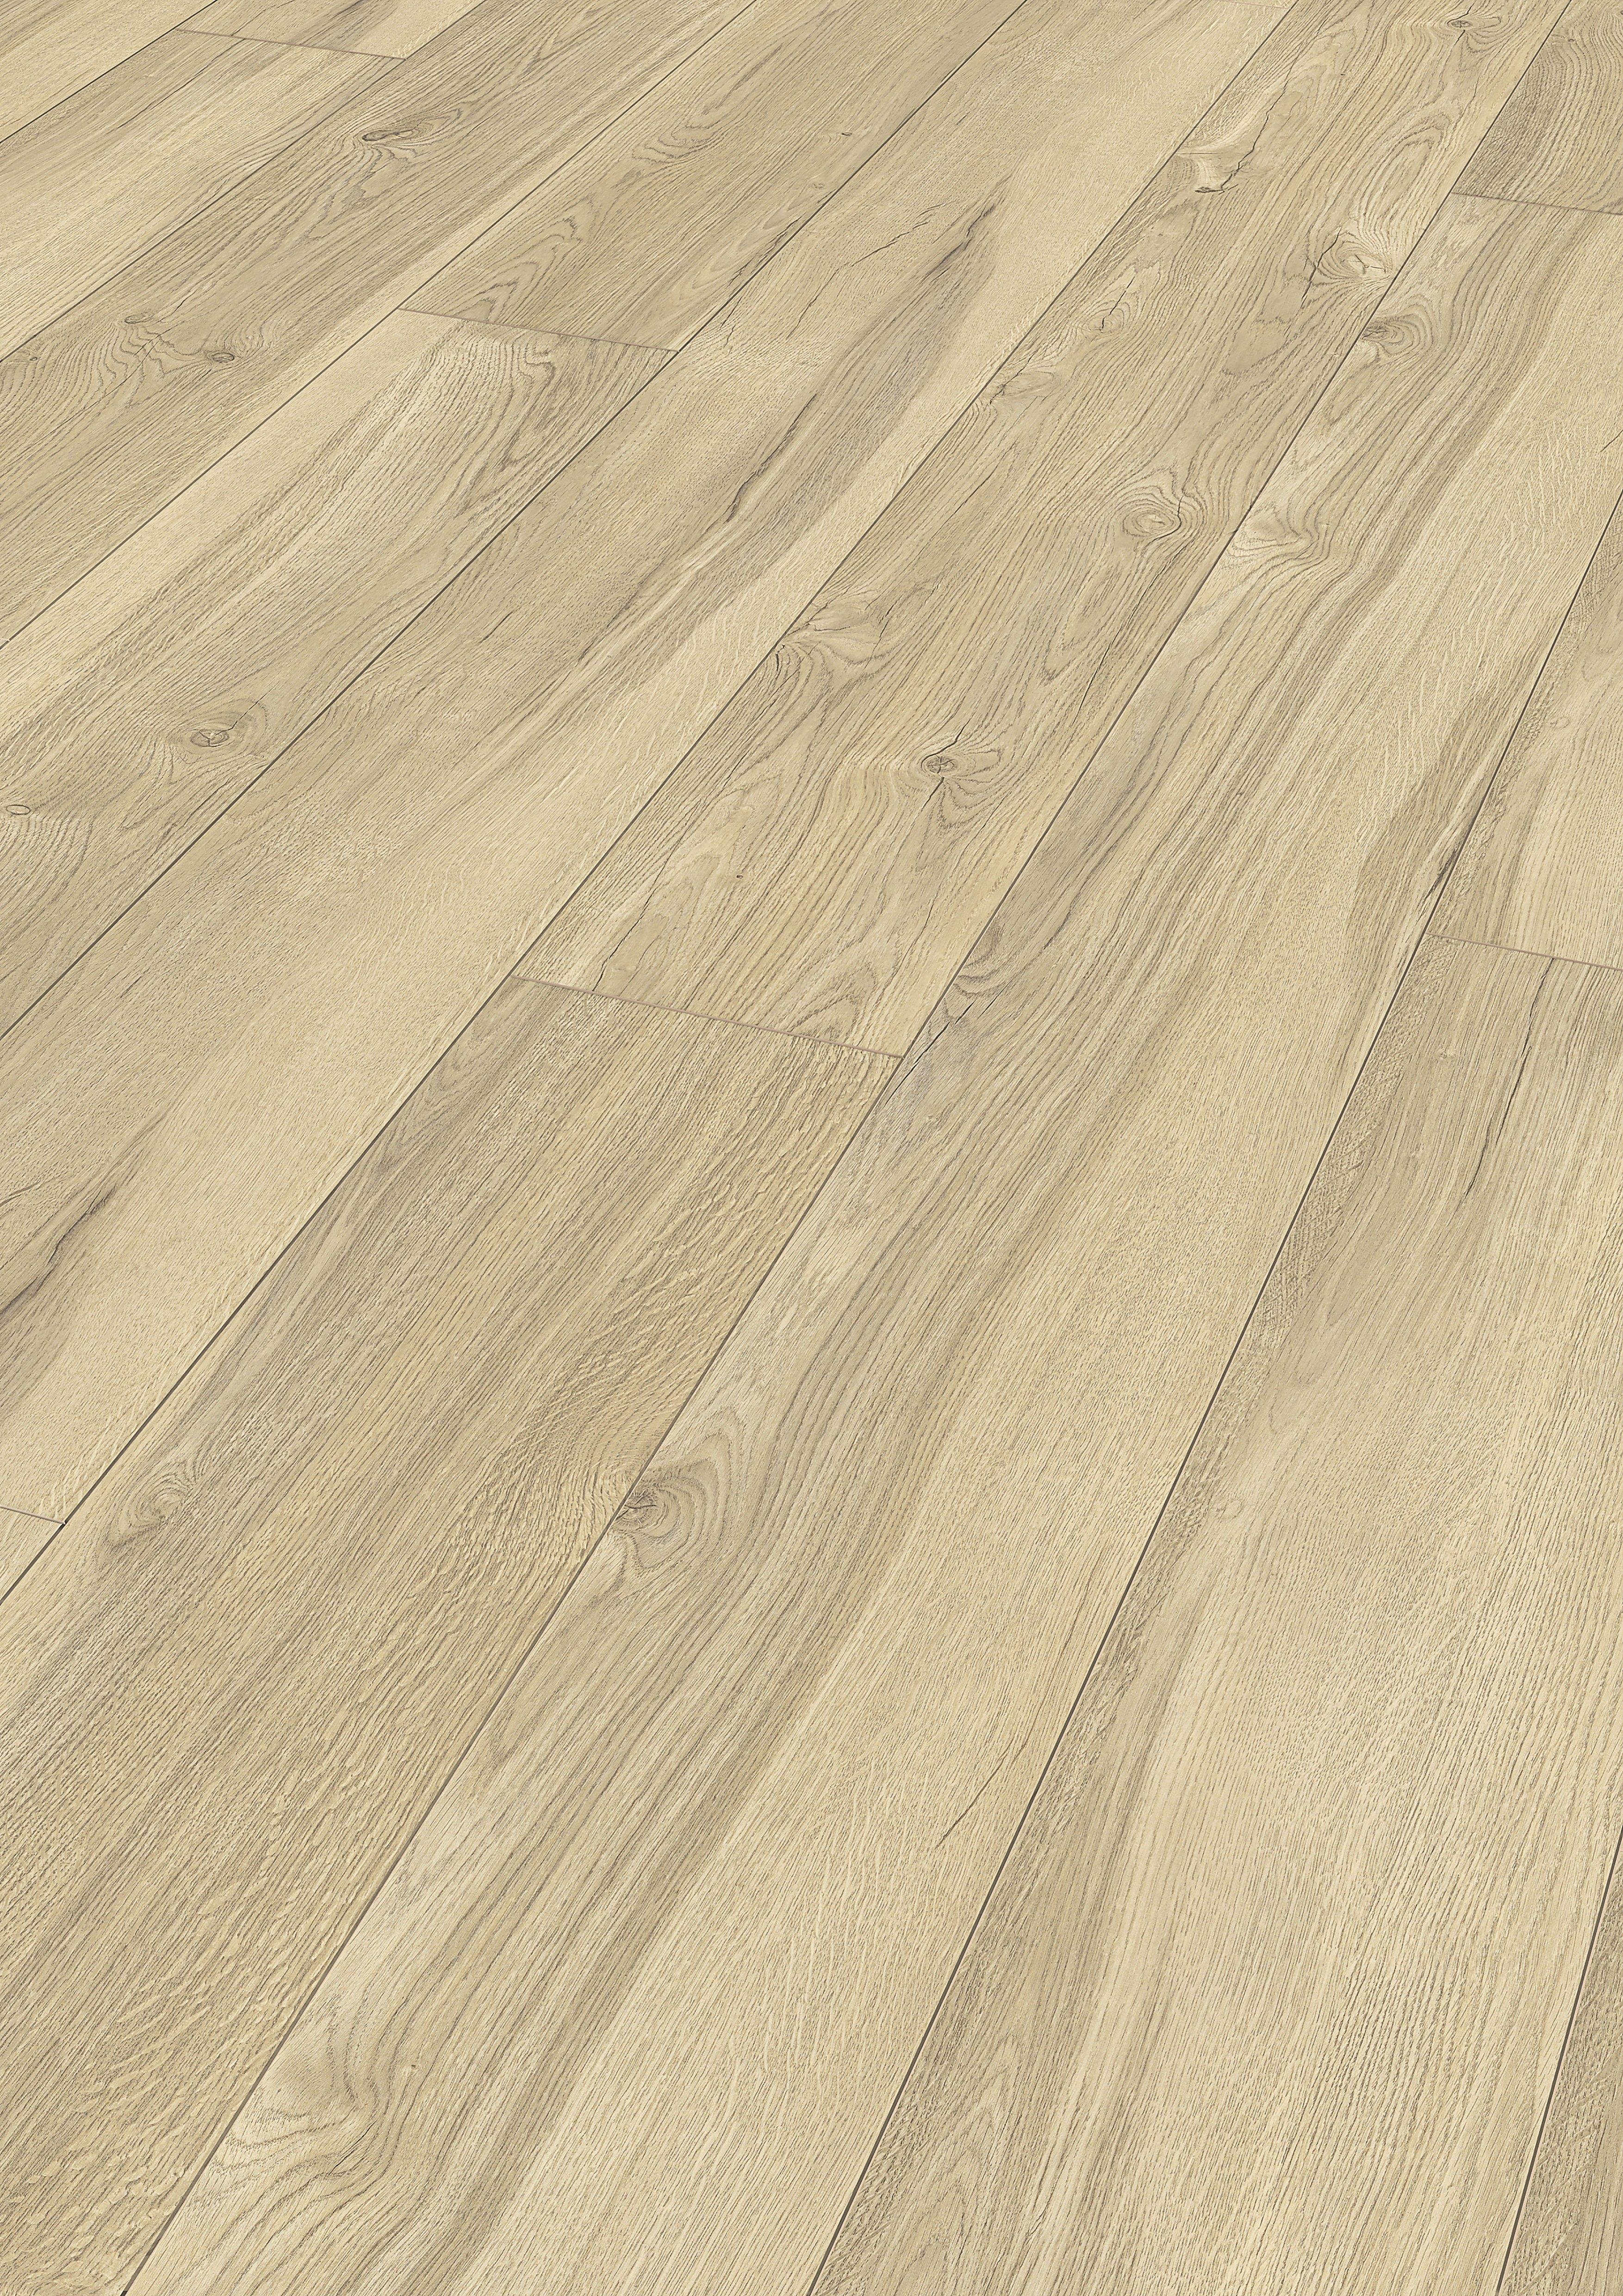 Distinctive Pure Oak L6273 | Raw Wood Pore Structure | Wood Effect